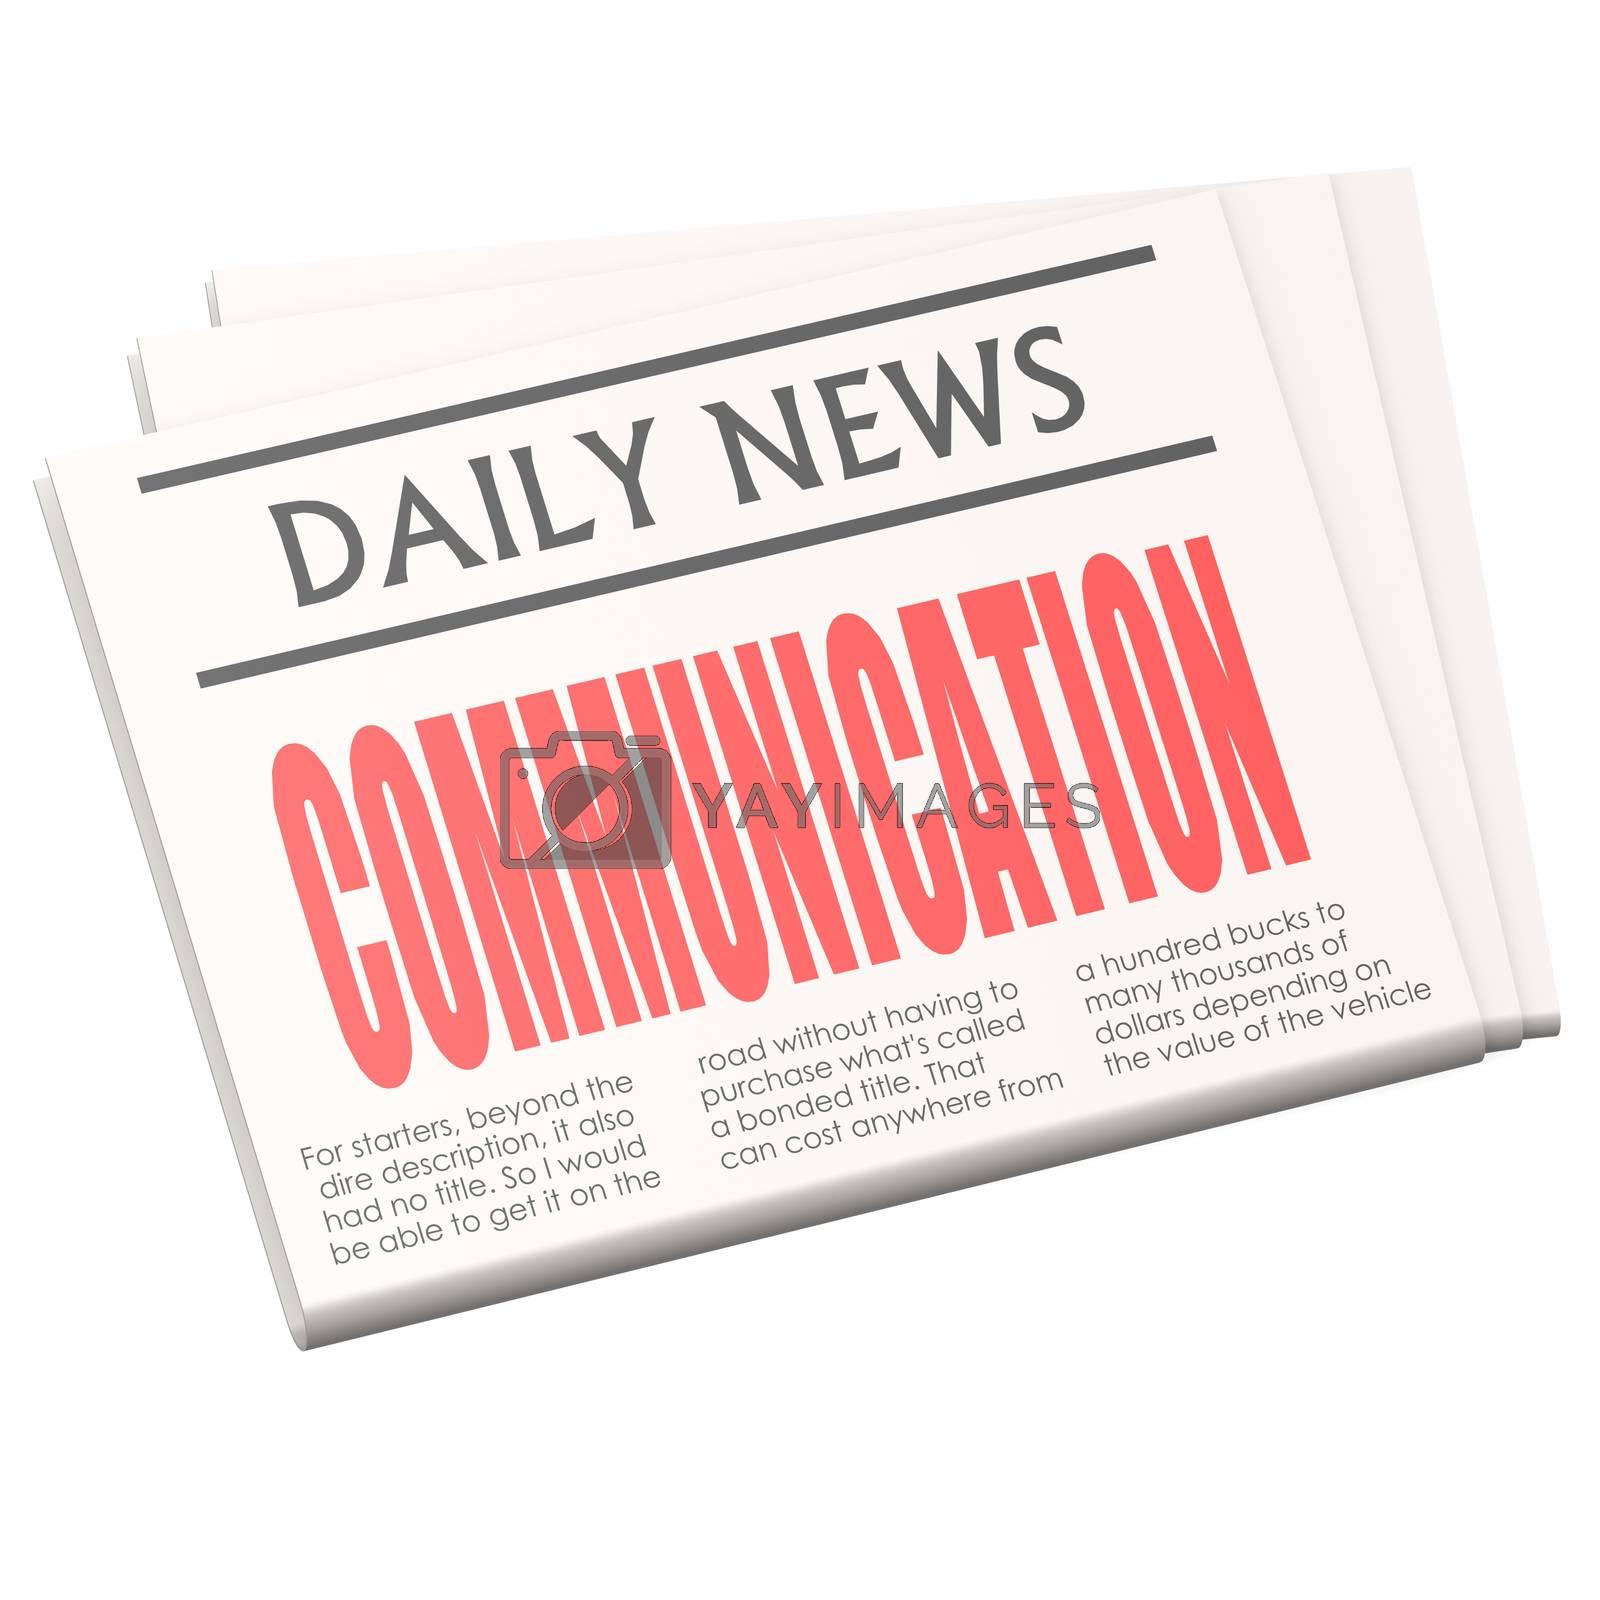 Newspaper communication